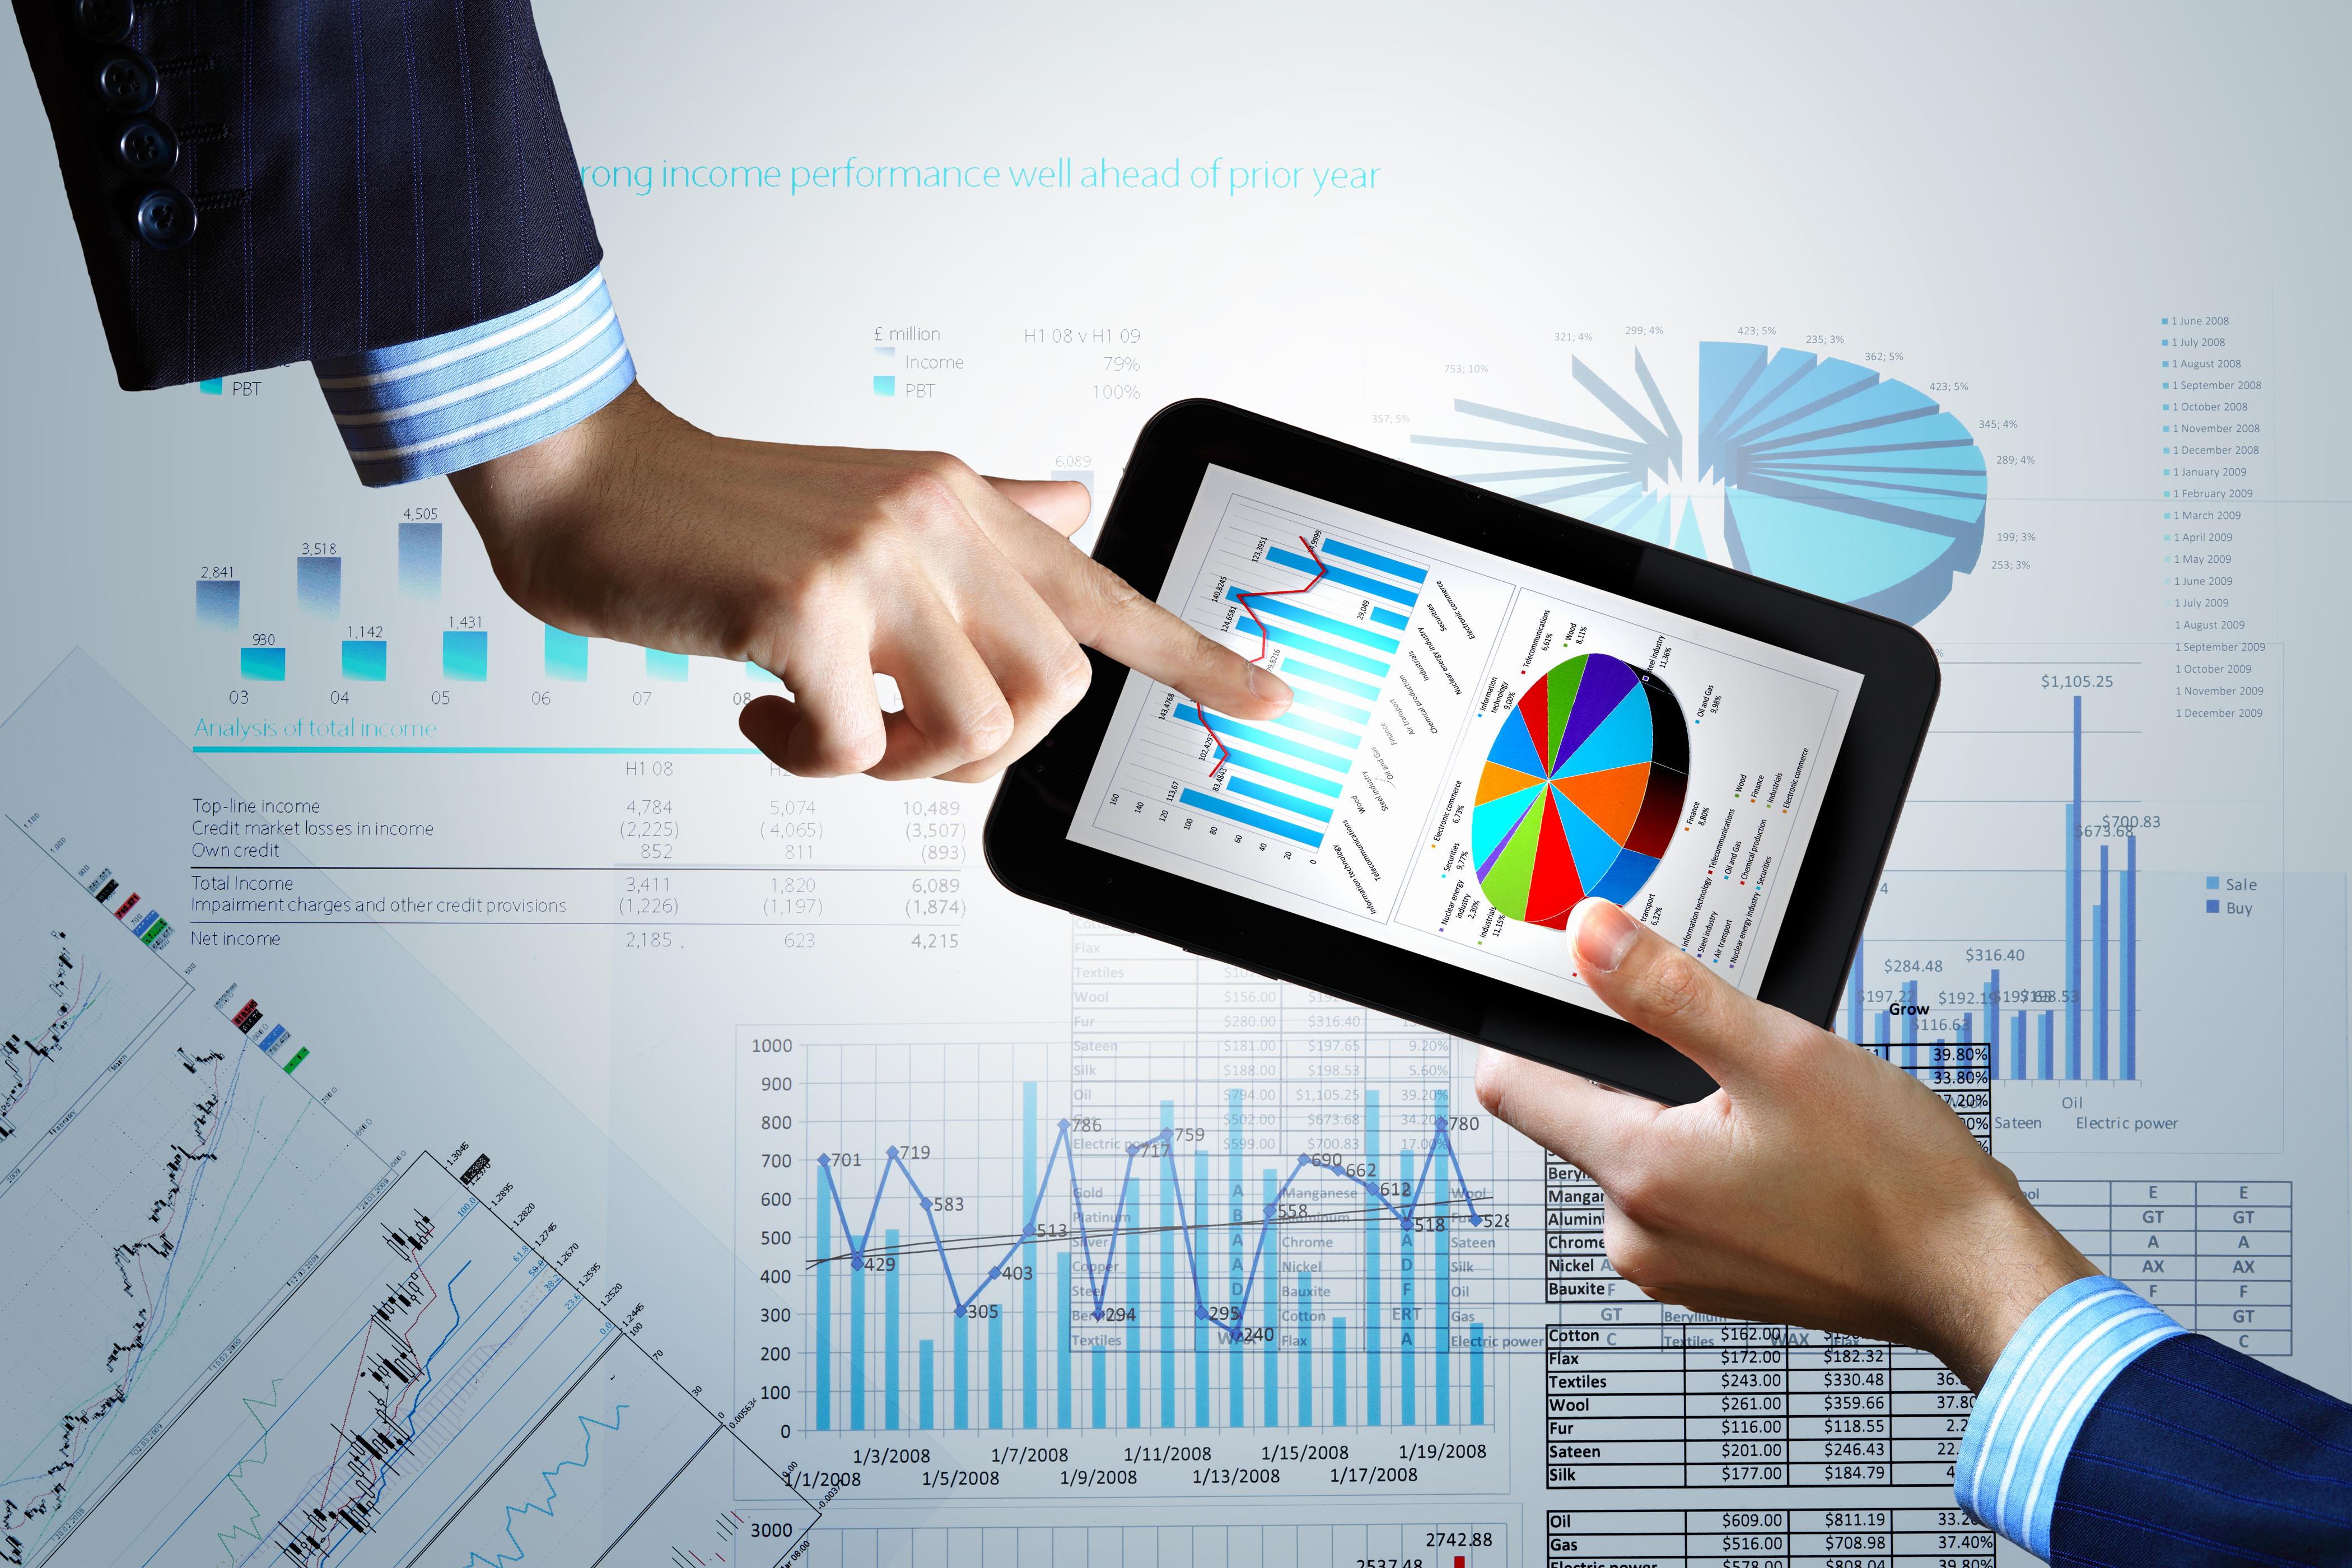 analytics healthcare business technology trends computer trend enterprise health modern intelligence